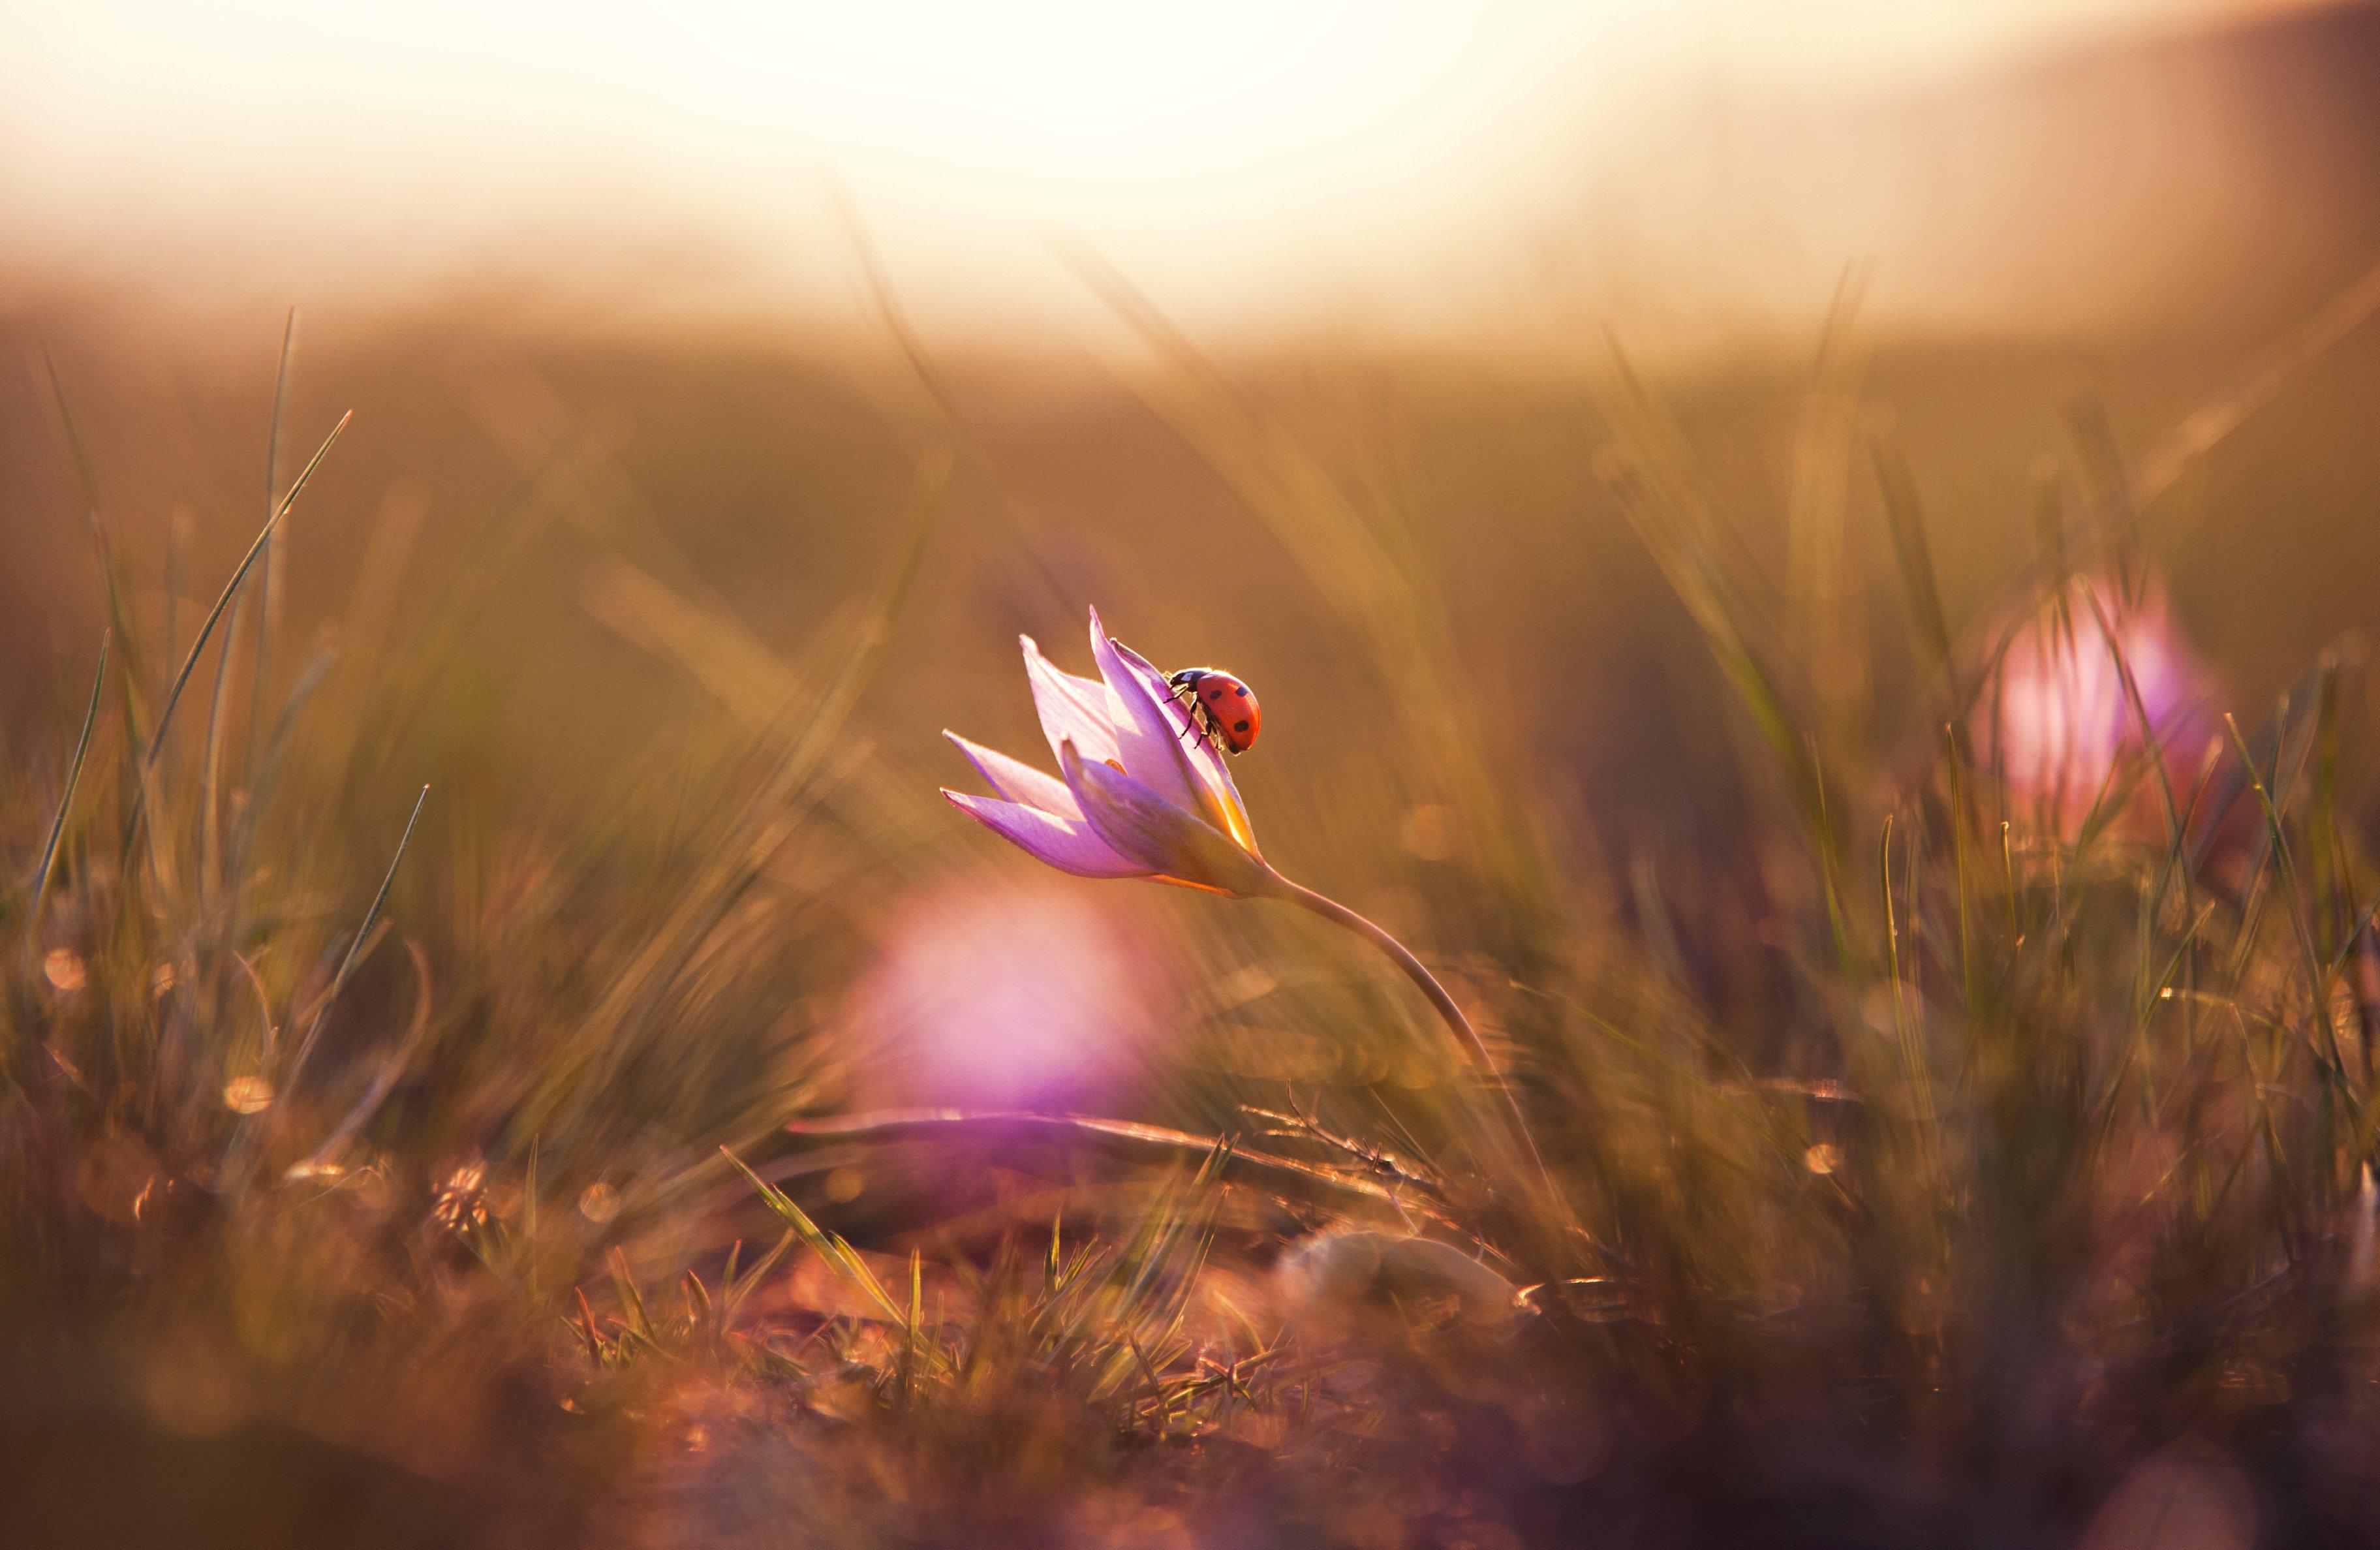 жук, коровка, цветок, весна, лучи, тепло, Логачёв Илья